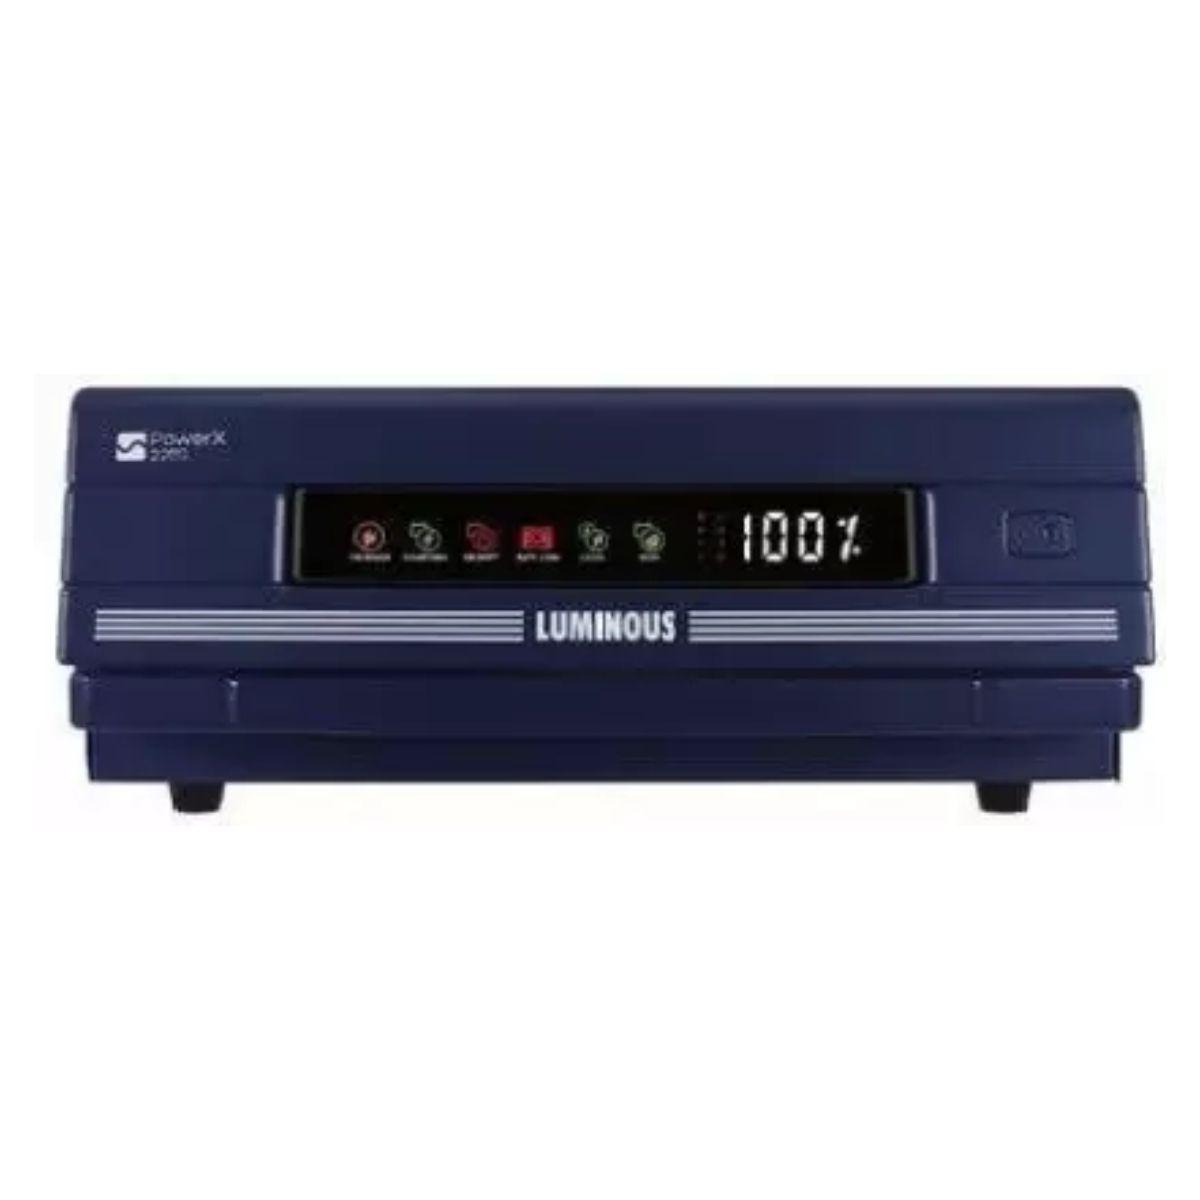 LUMINOUS POWERX 2250 Pure Sine Wave Inverter